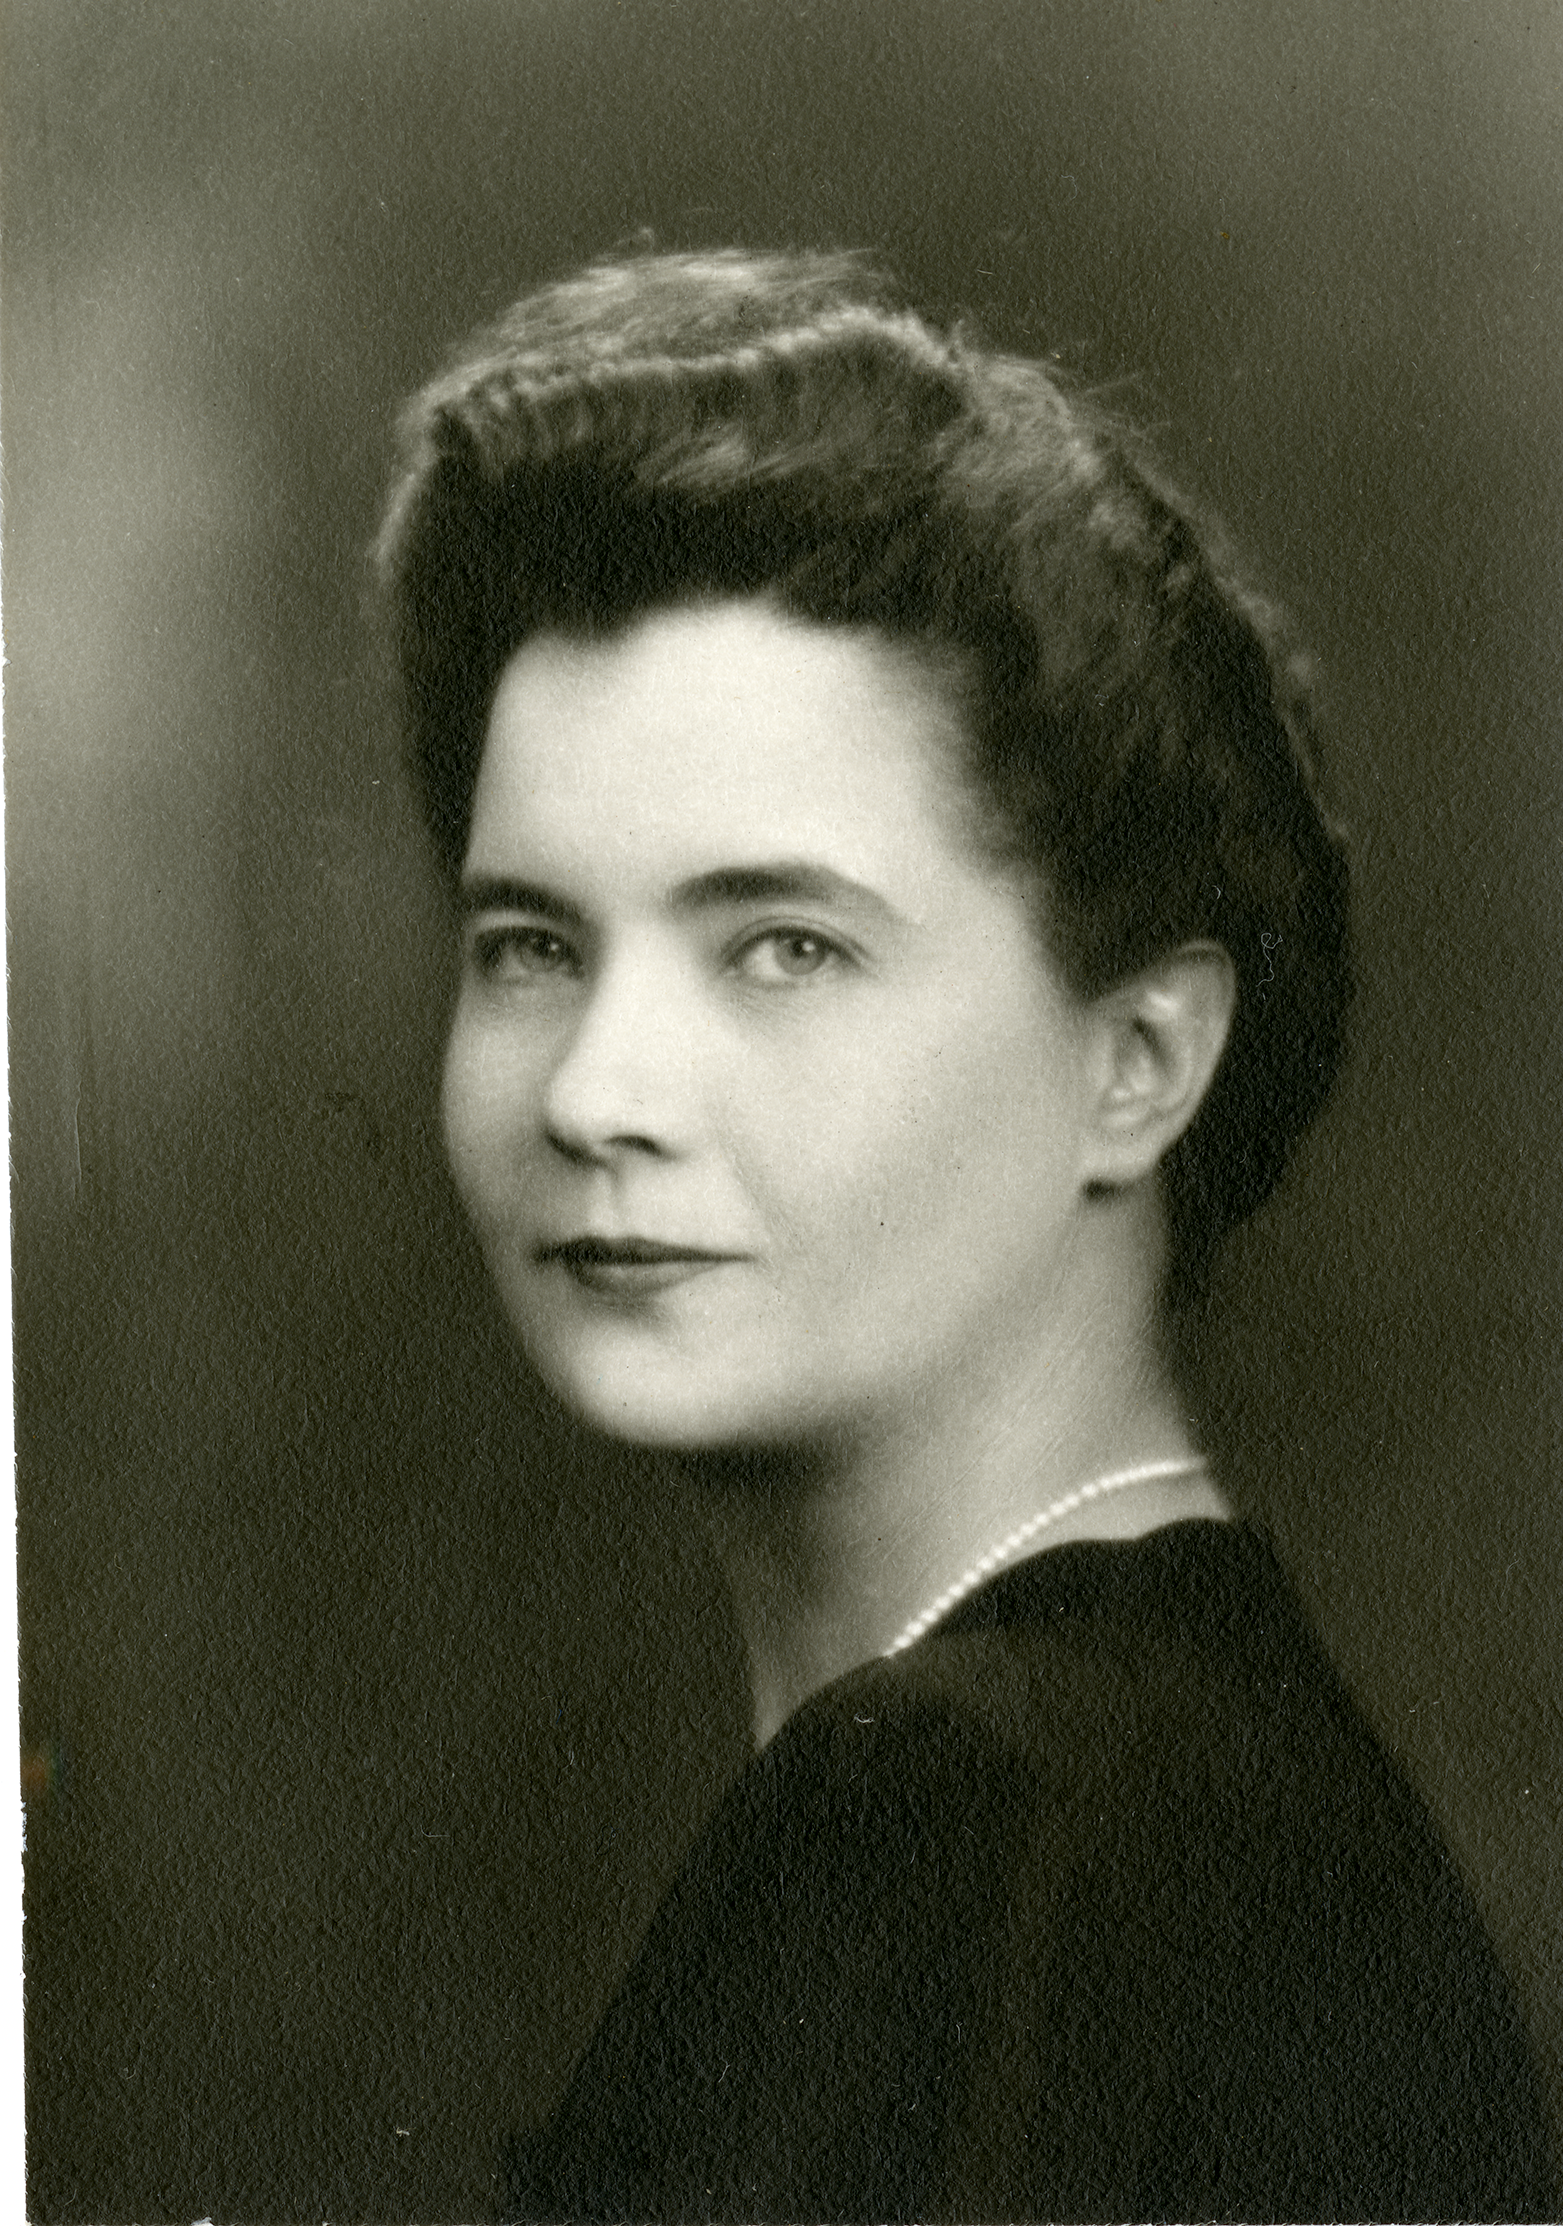 Portrait of Lois Bing, O.D., circa 1950